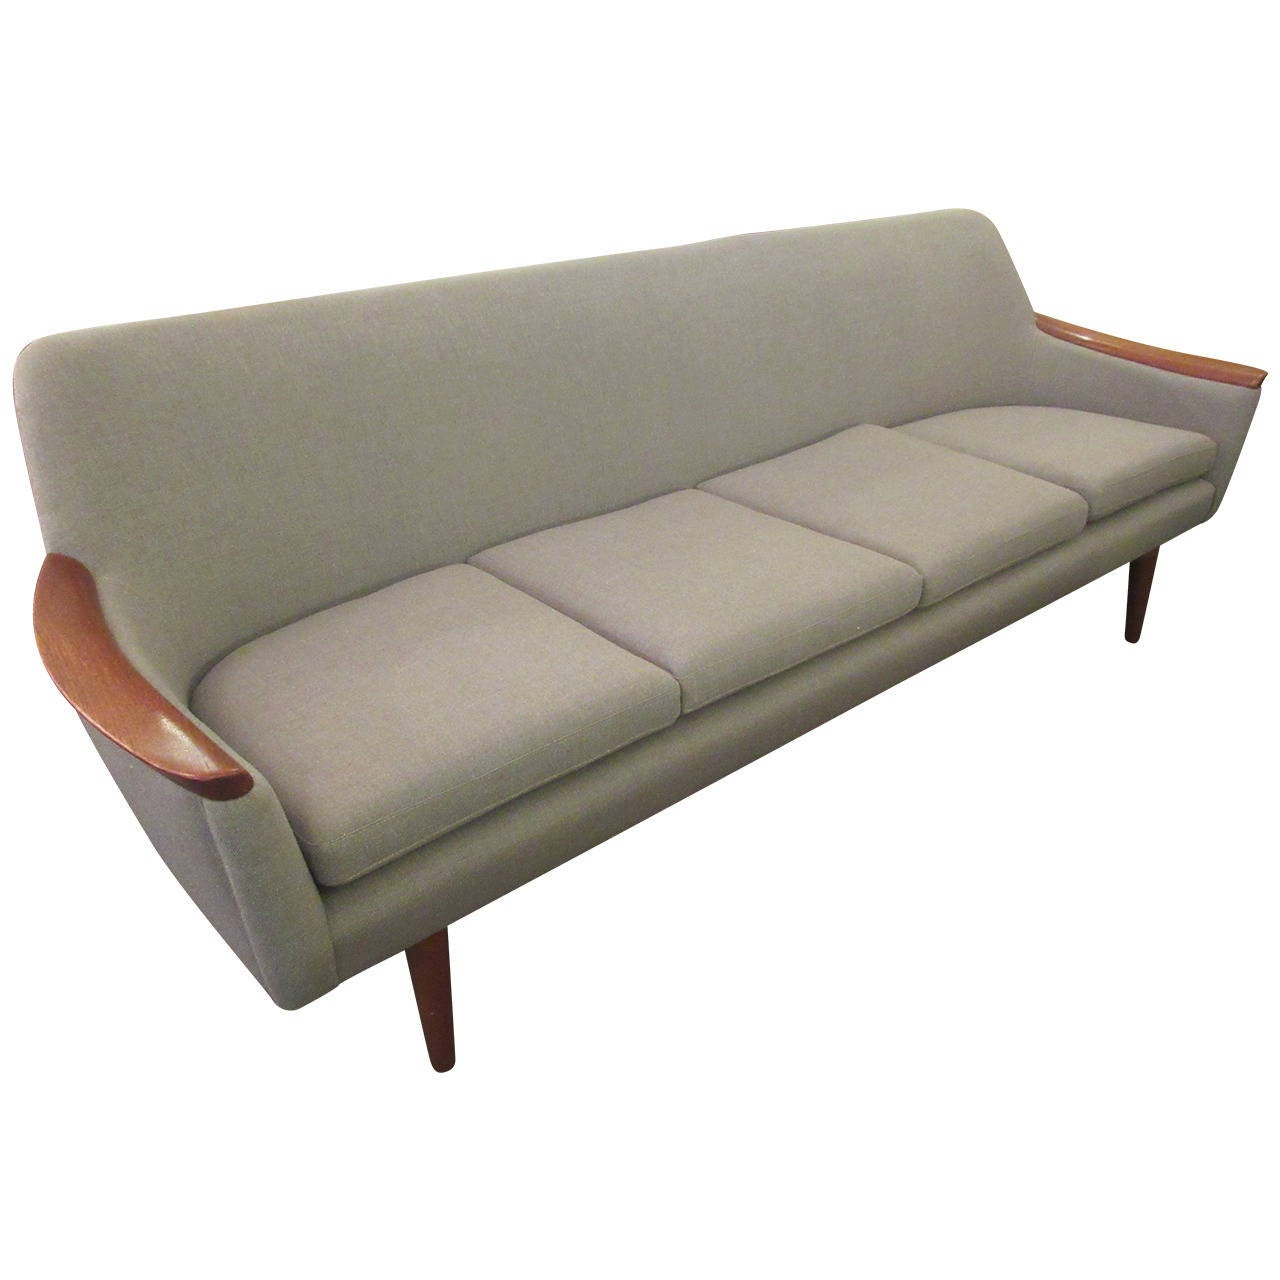 1960s Danish Sofa At 1stdibs